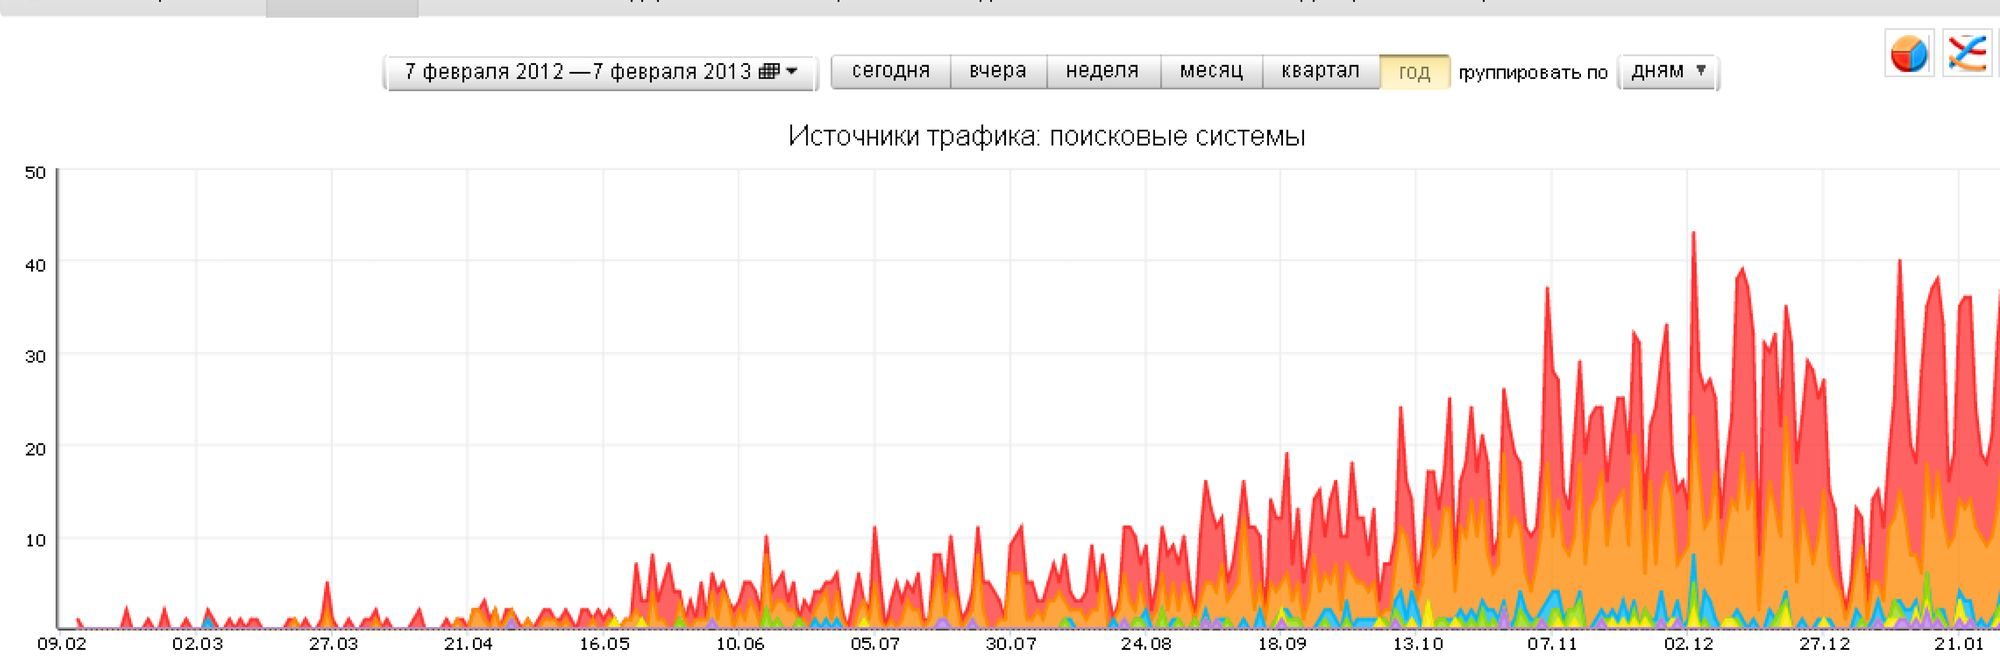 <h1>Новый дизайн сайта structuravody.ru</h1>